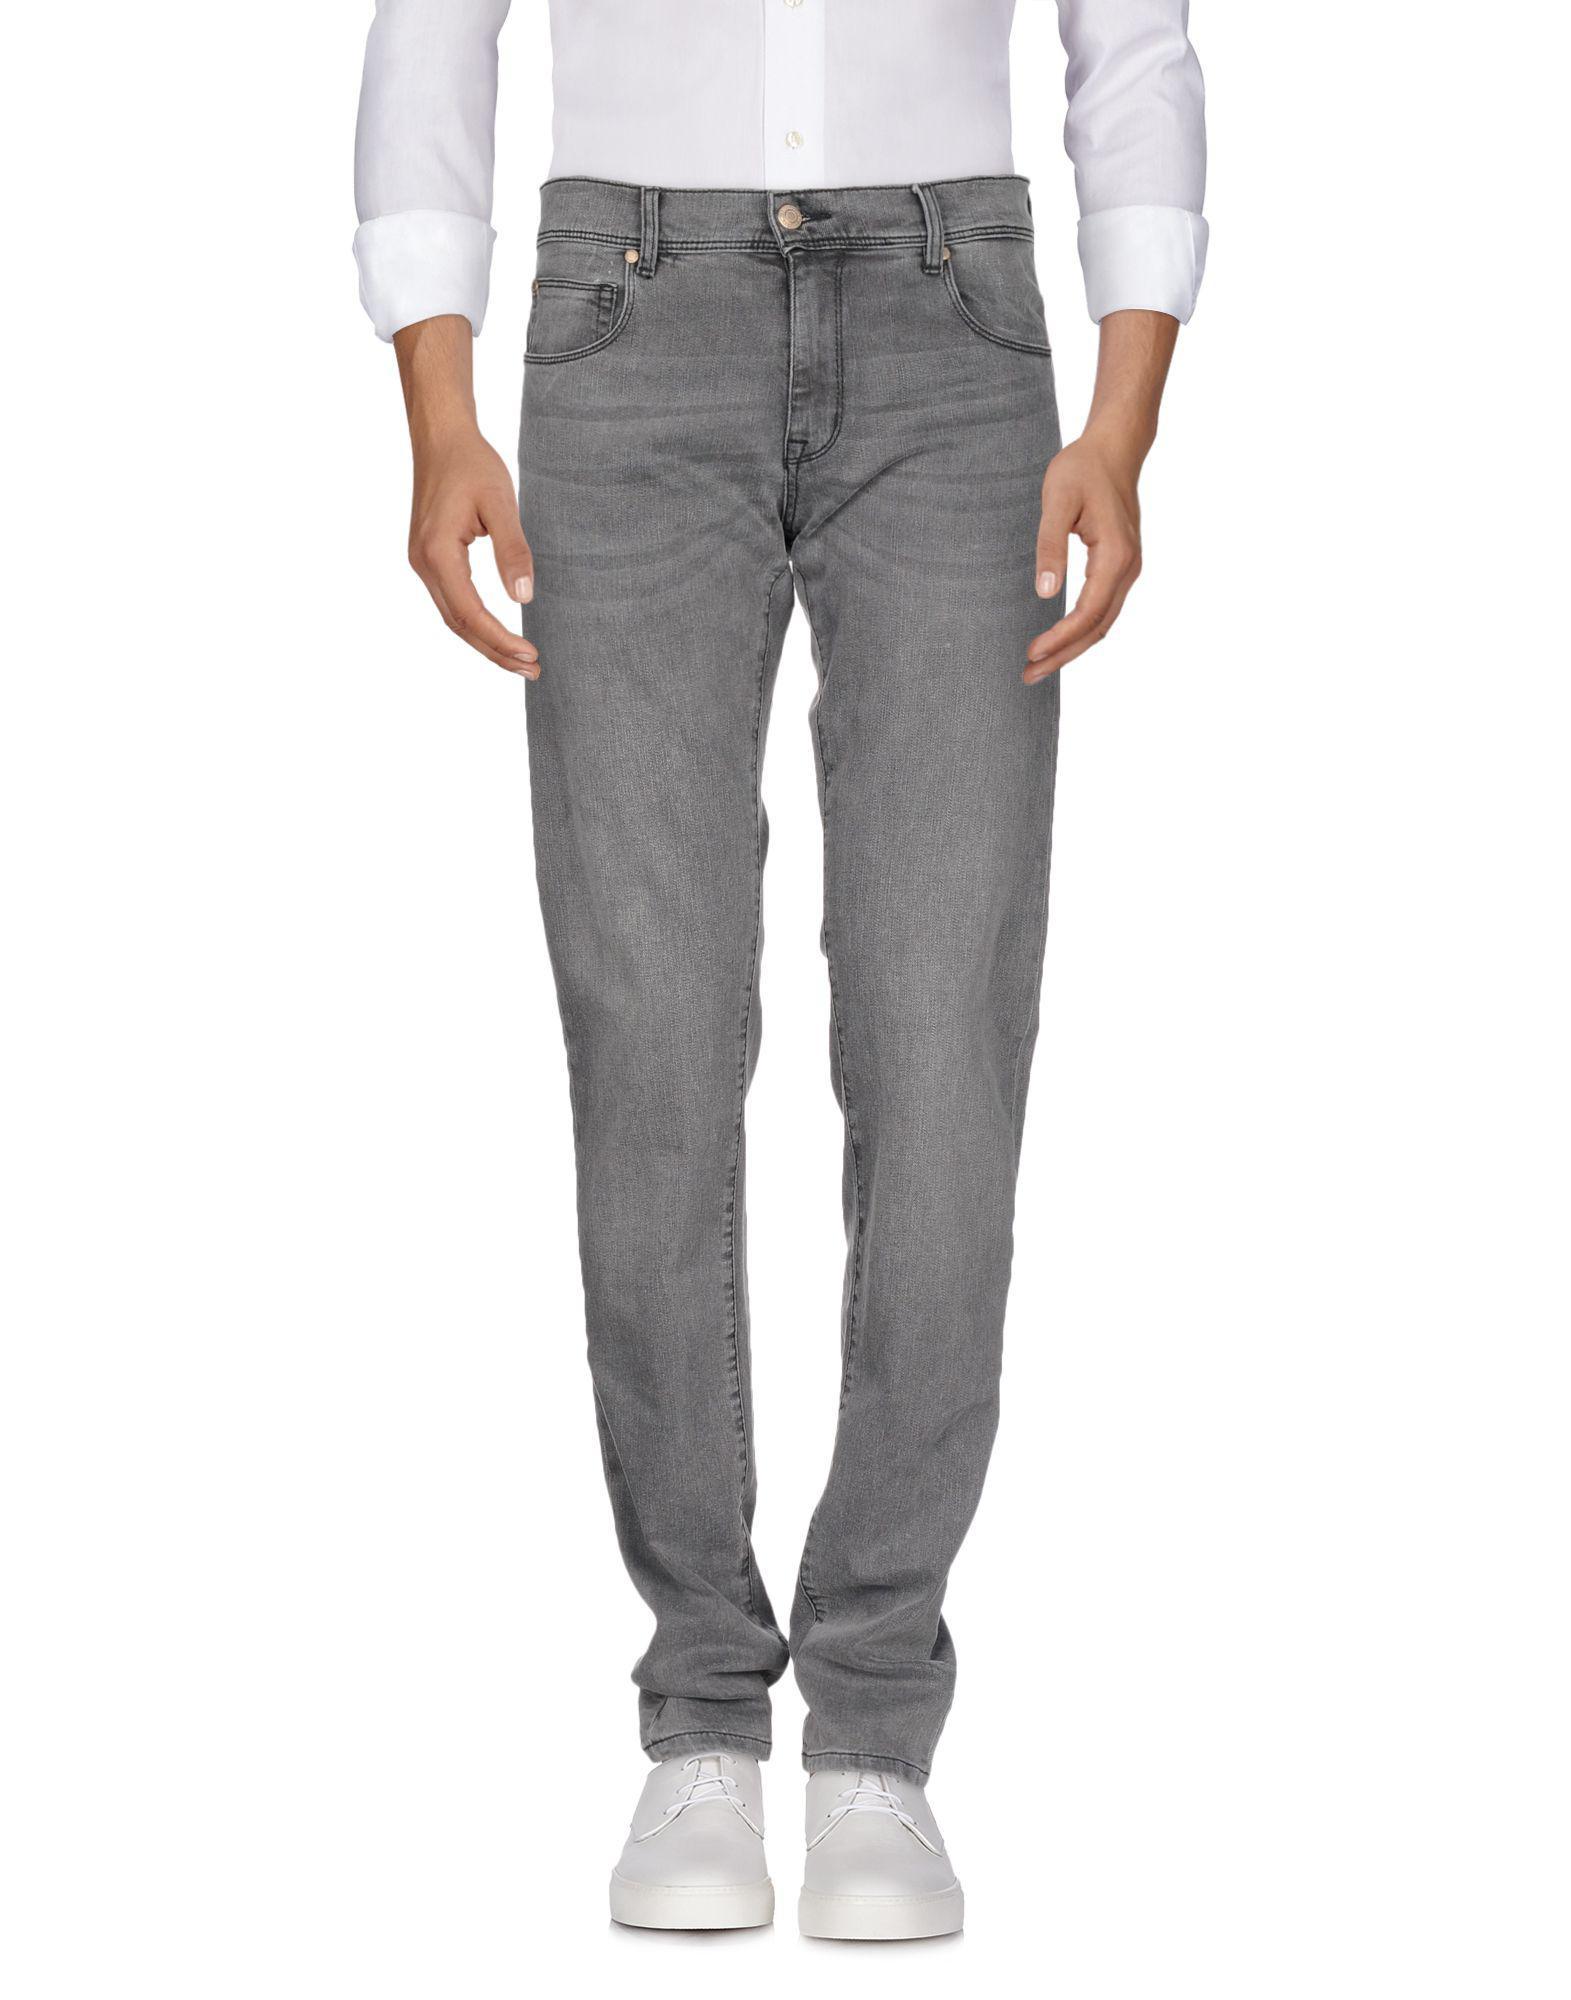 DENIM - Denim trousers Billtornade hTa97